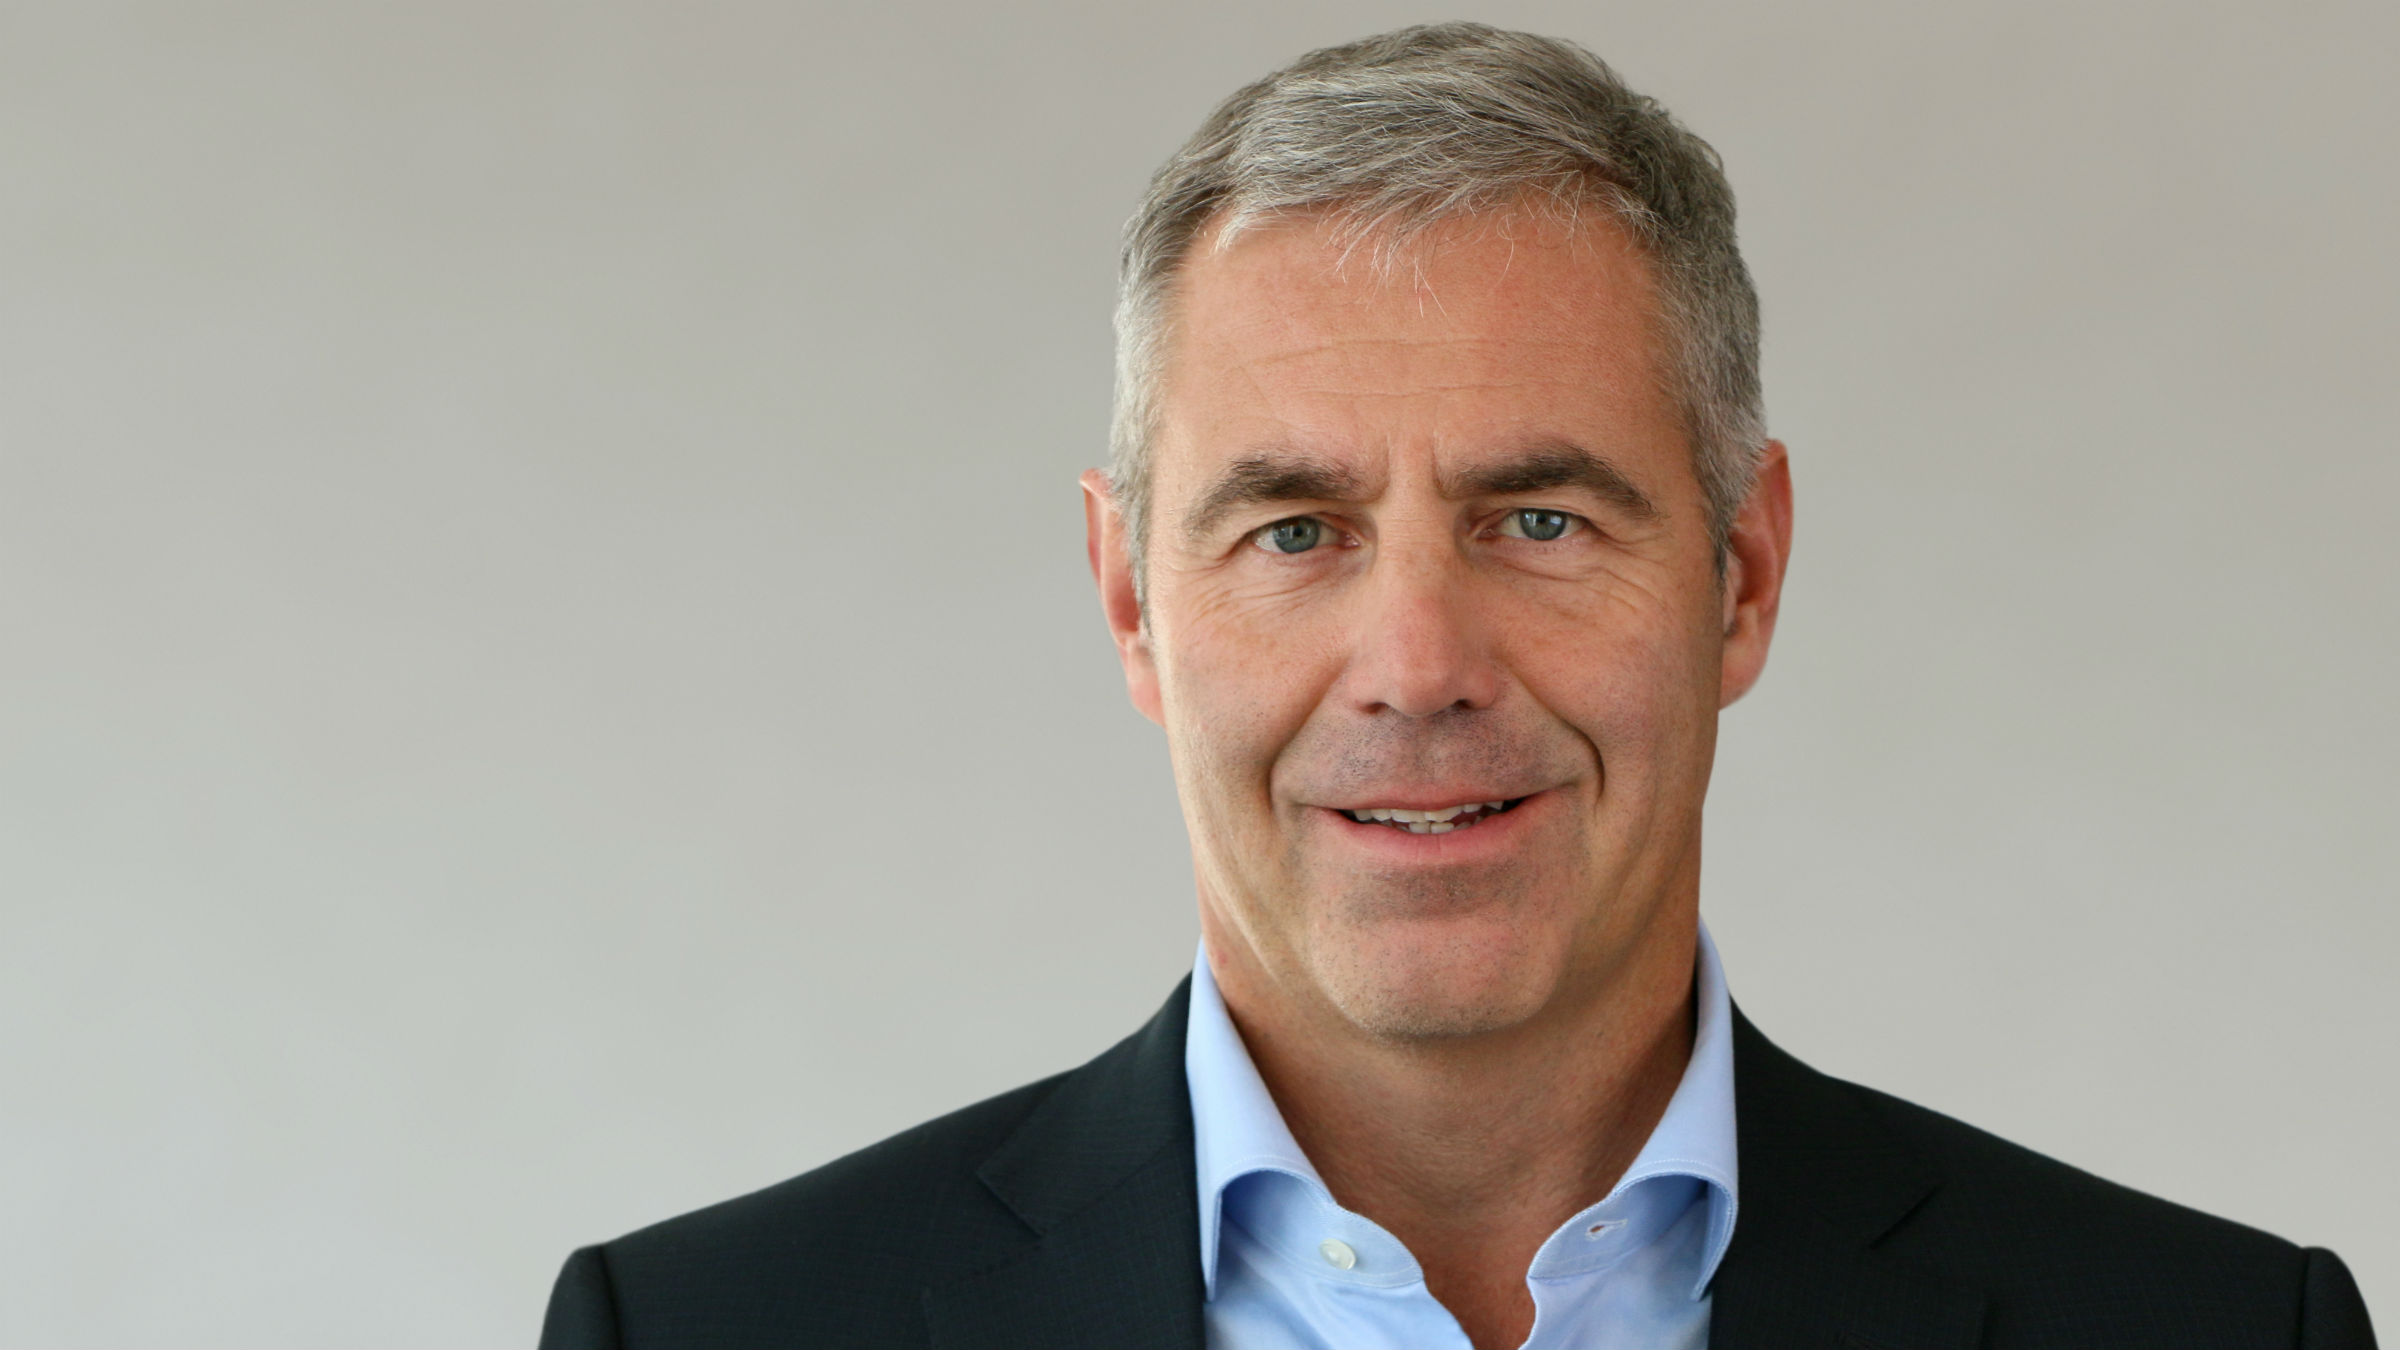 Stefan Klebert